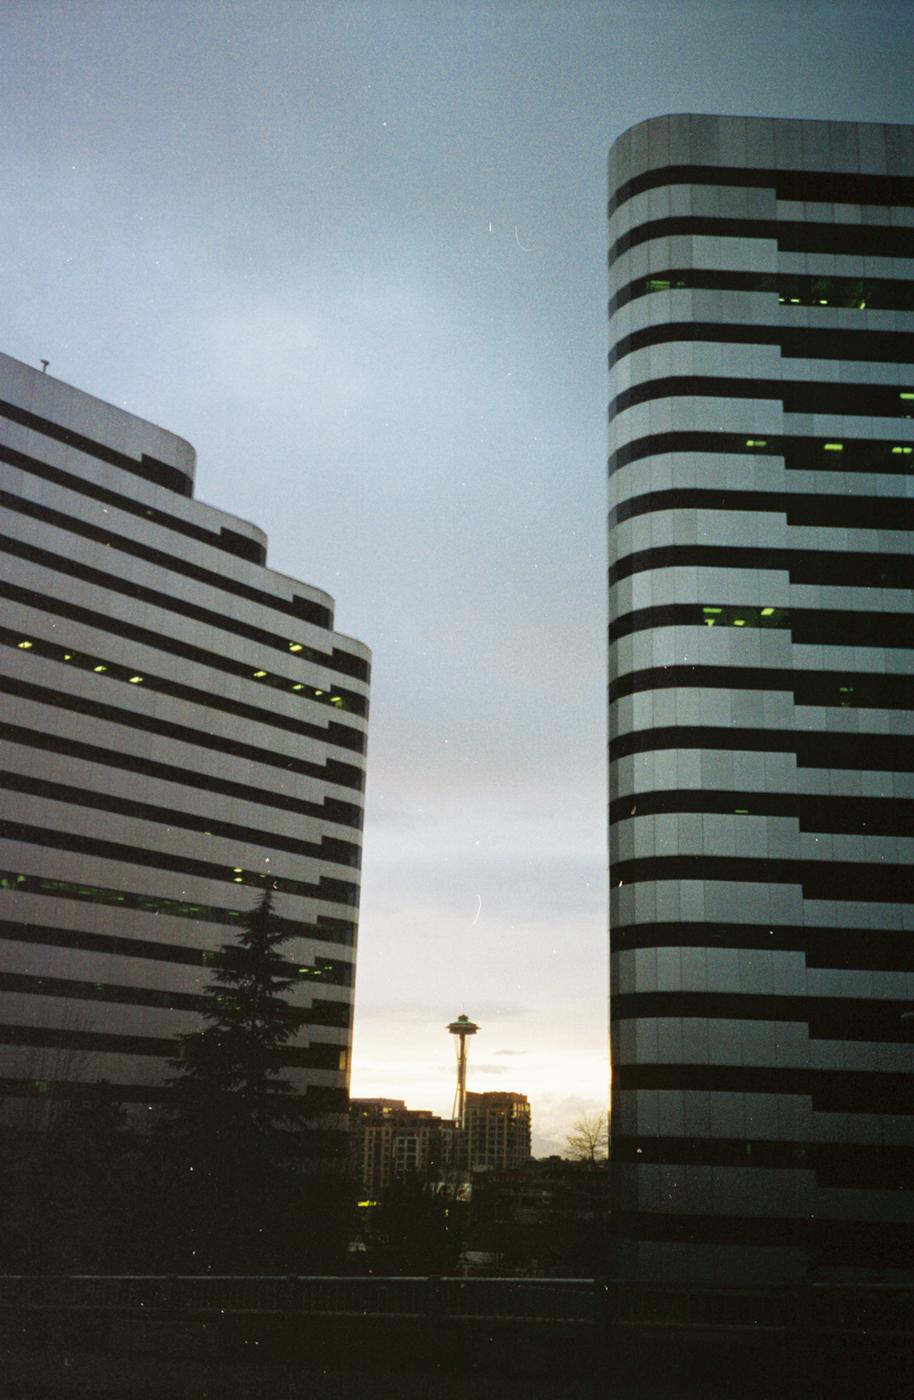 35mm-13.jpg